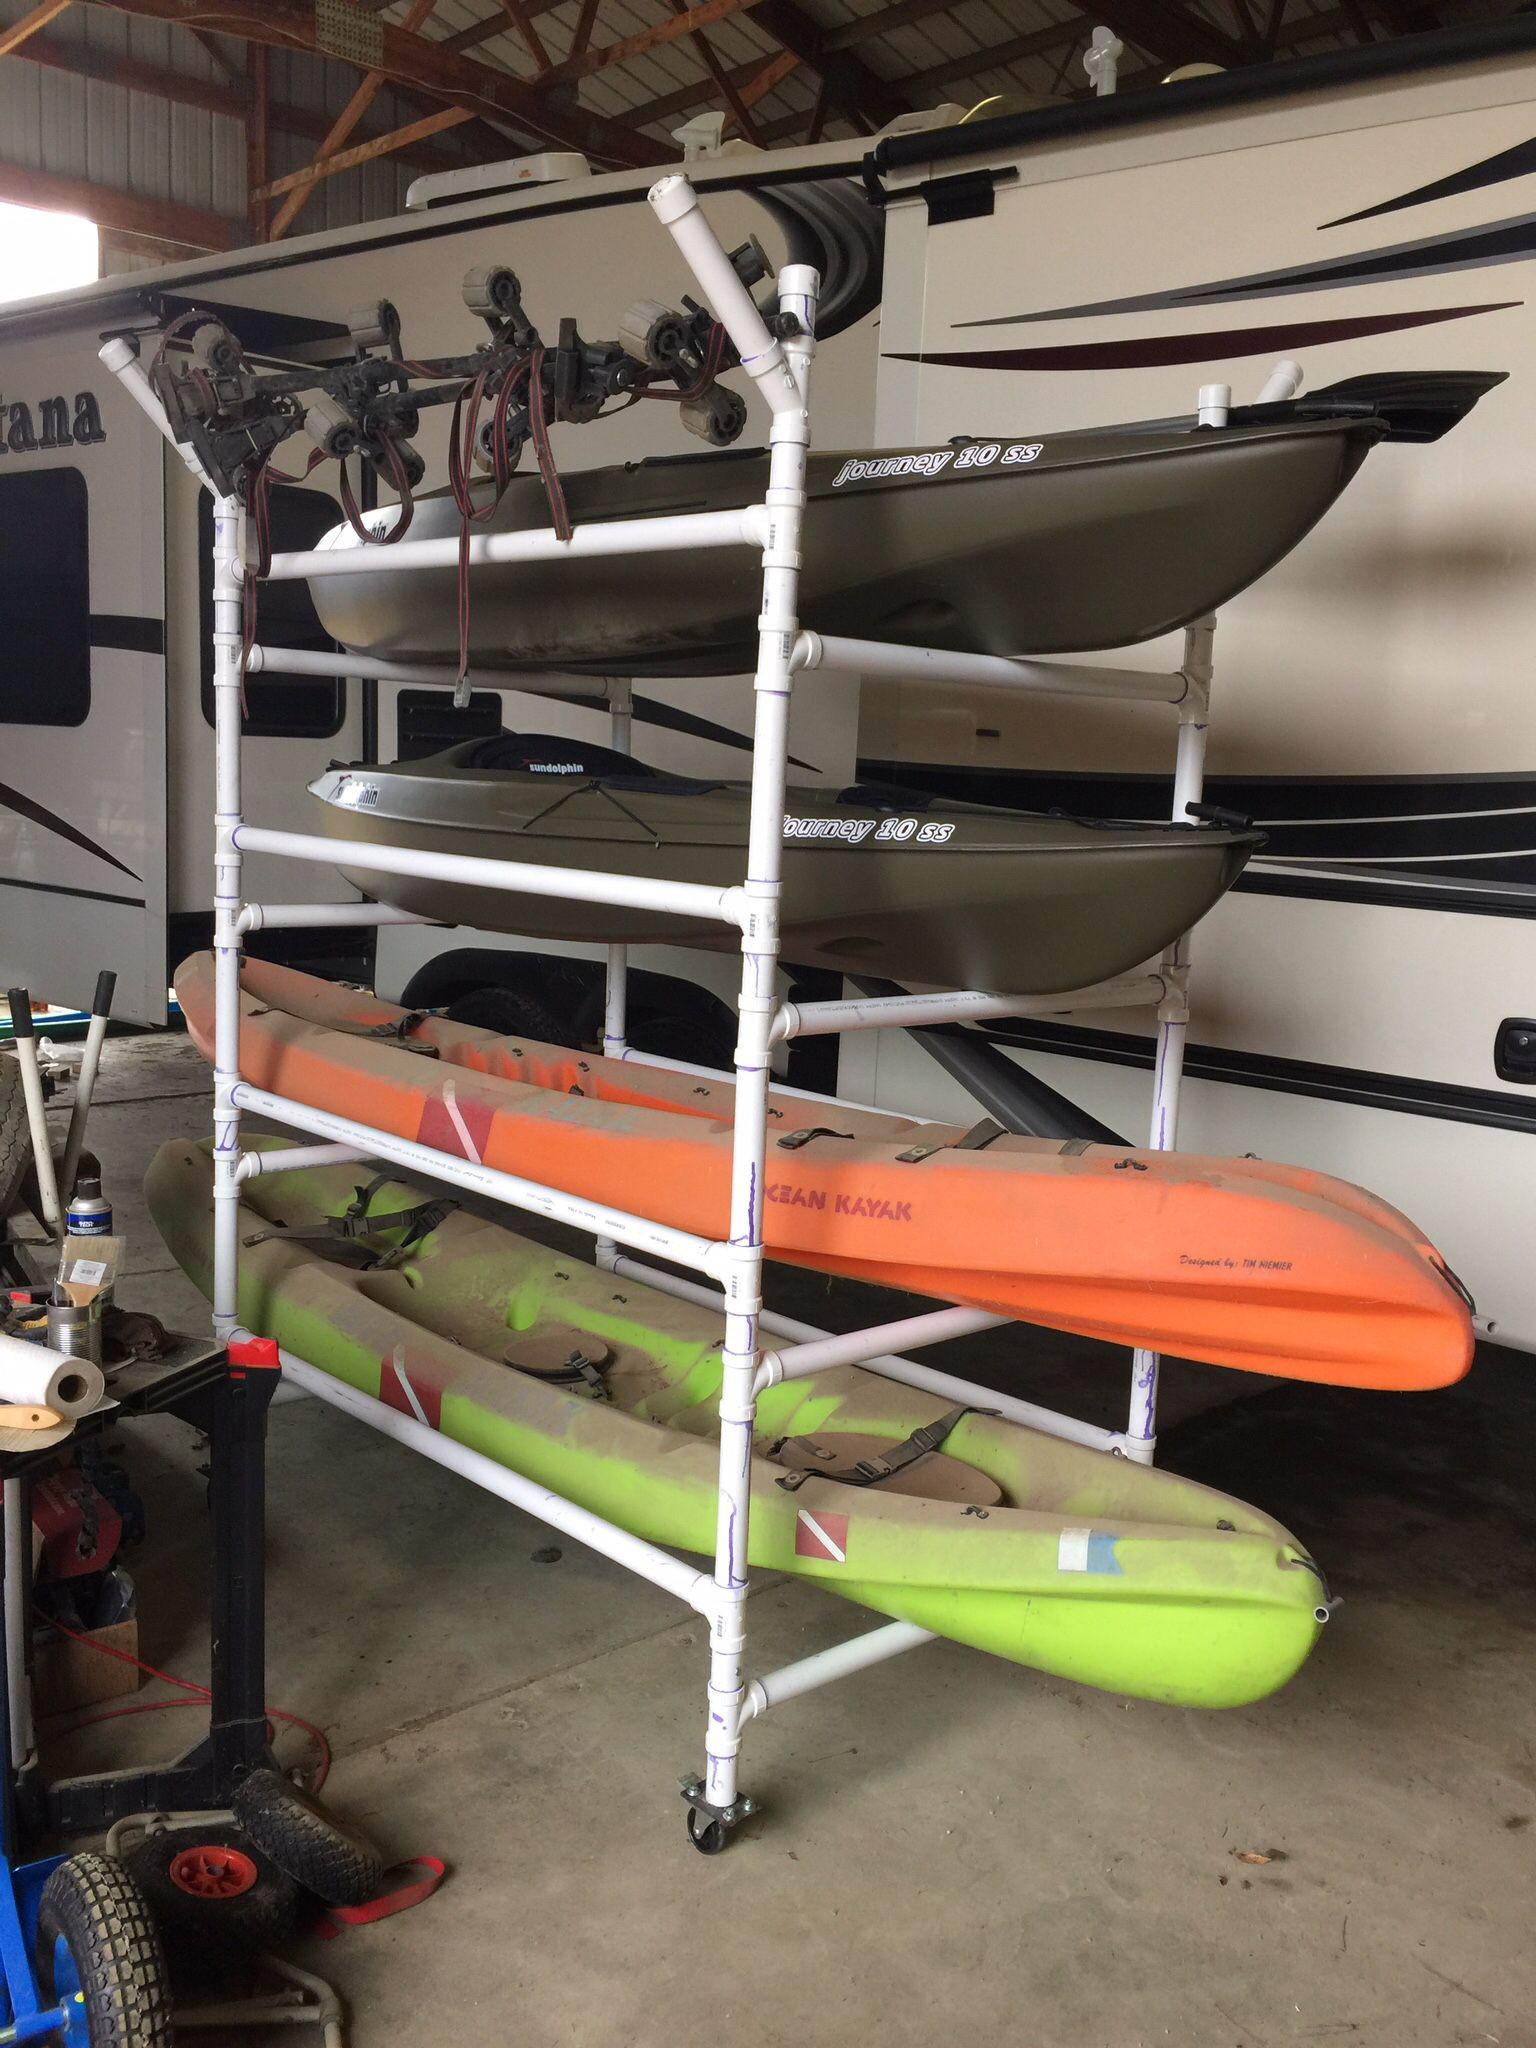 Best ideas about Kayak Storage Rack DIY . Save or Pin Homemade PVC kayak rack can store 4 kayaks paddles Now.